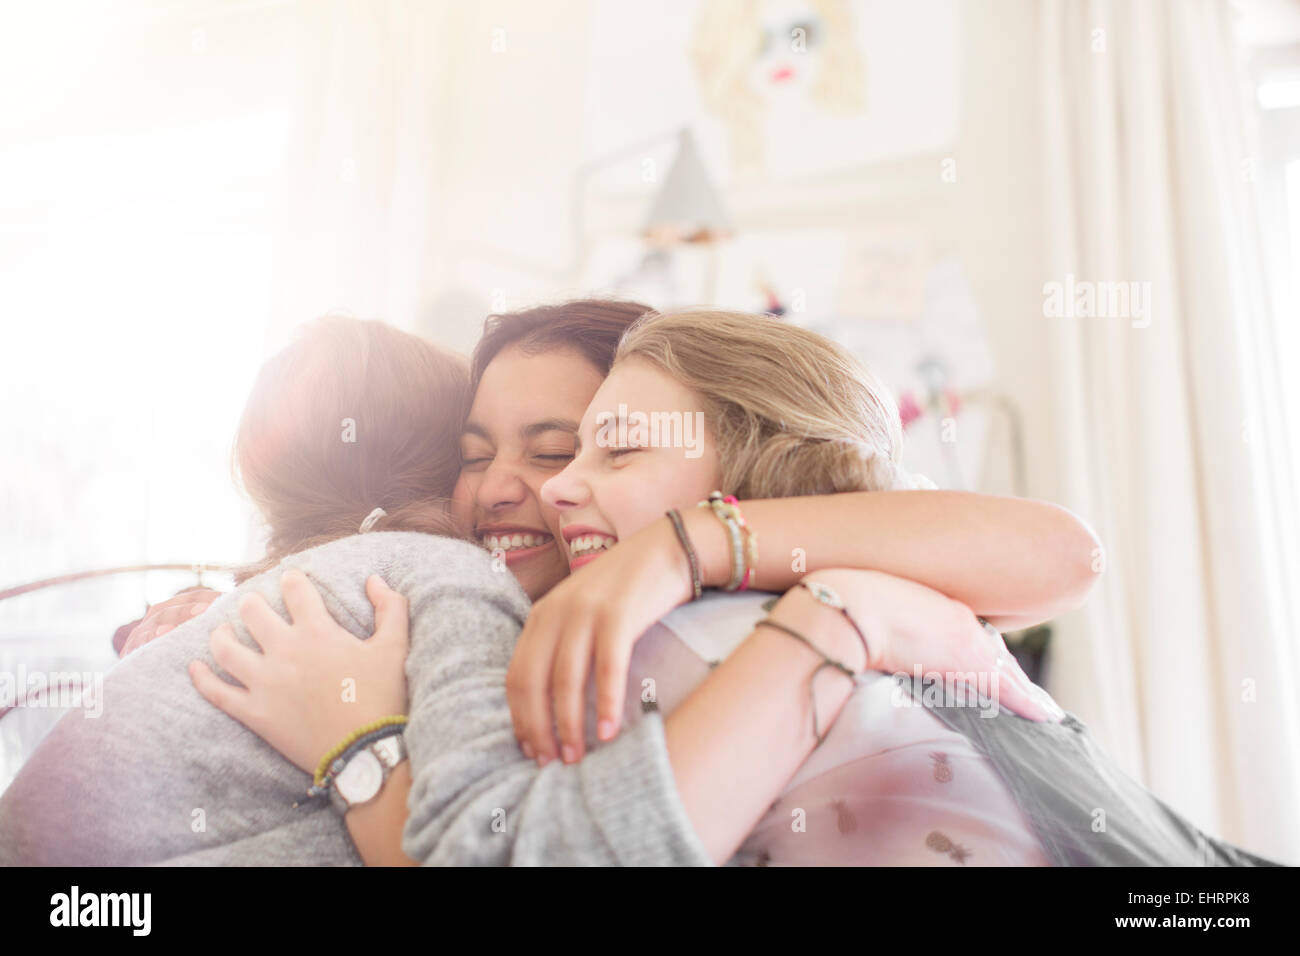 Three teenage girls embracing at home - Stock Image